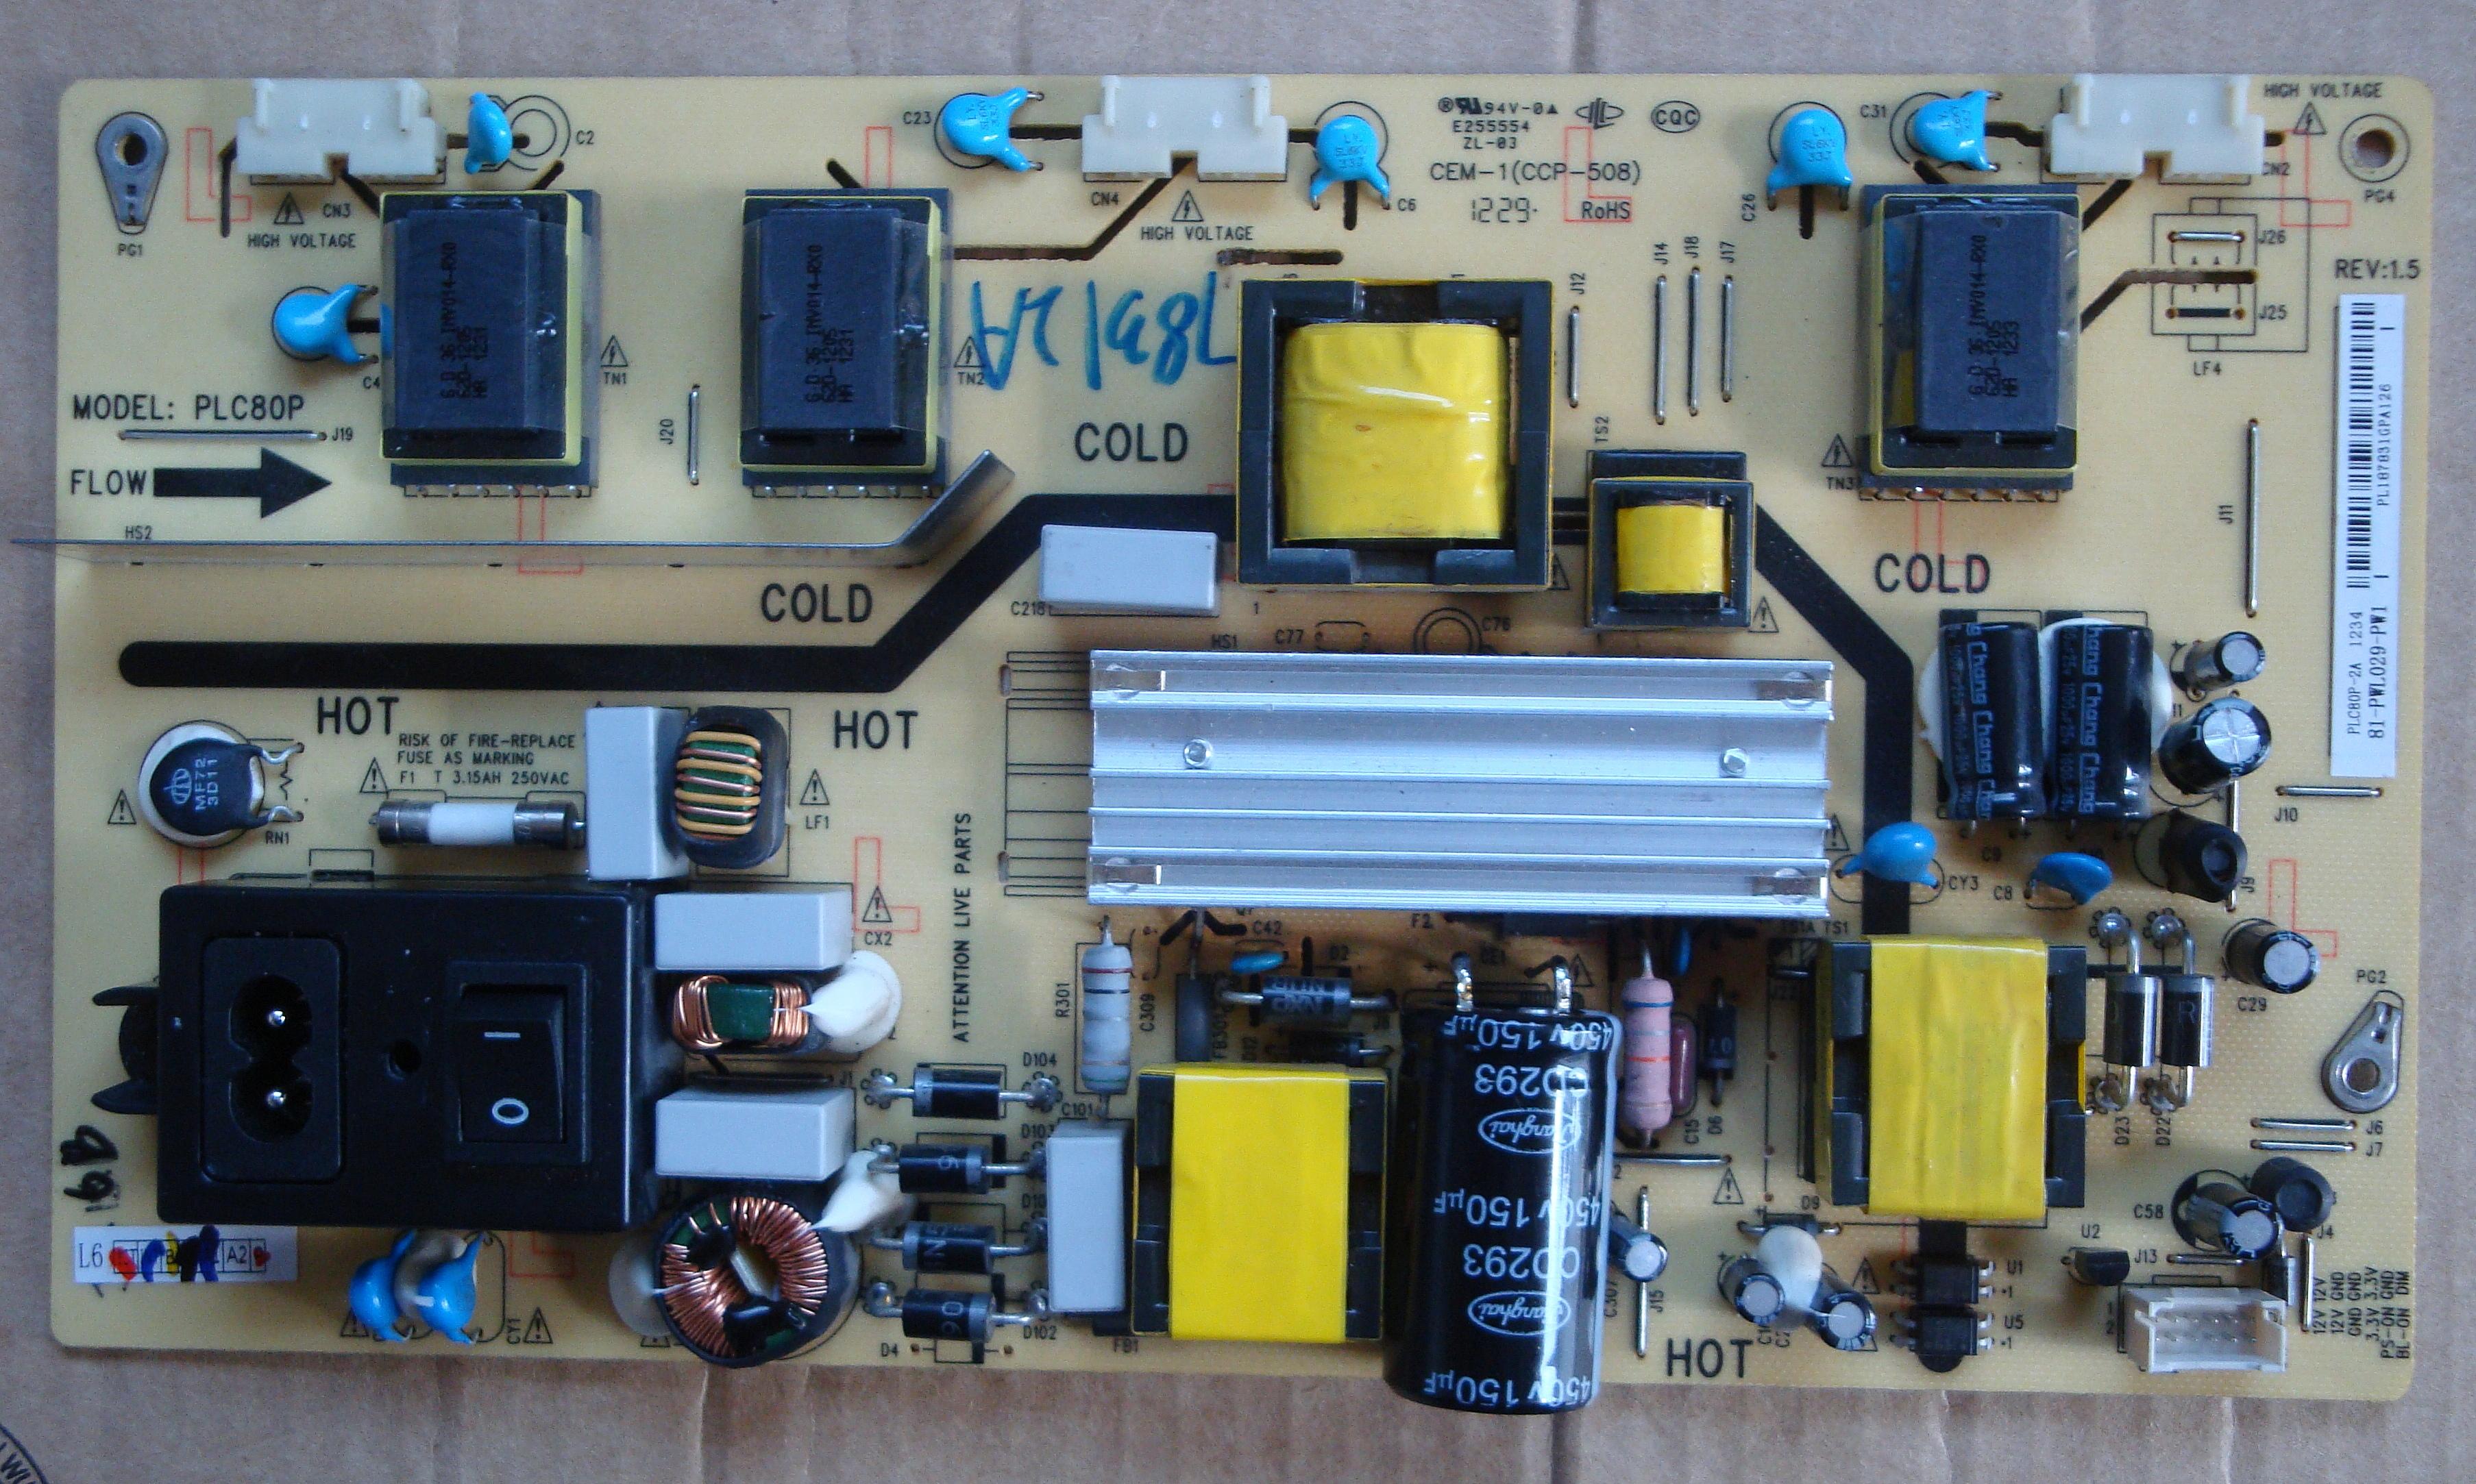 PLC80C_001.JPG